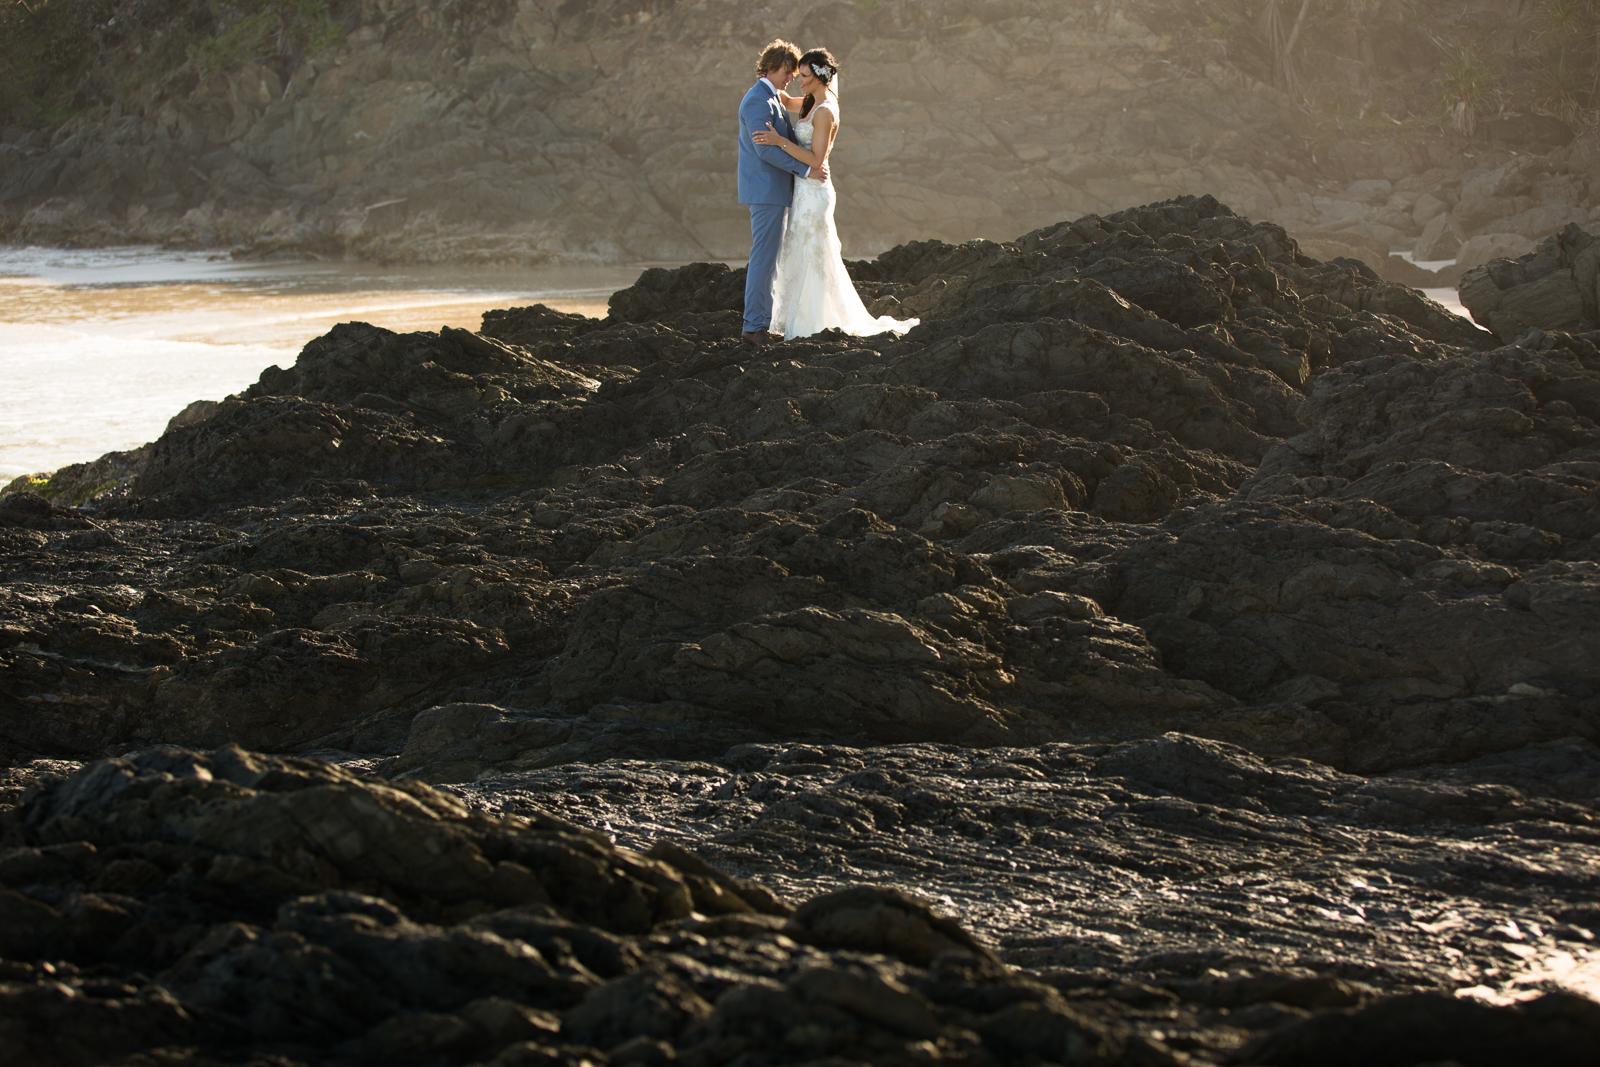 26Bec_Kilpatrick_Photography_Stephanie_and_Mark_Broken_Head_Wedding_Portraits-750722